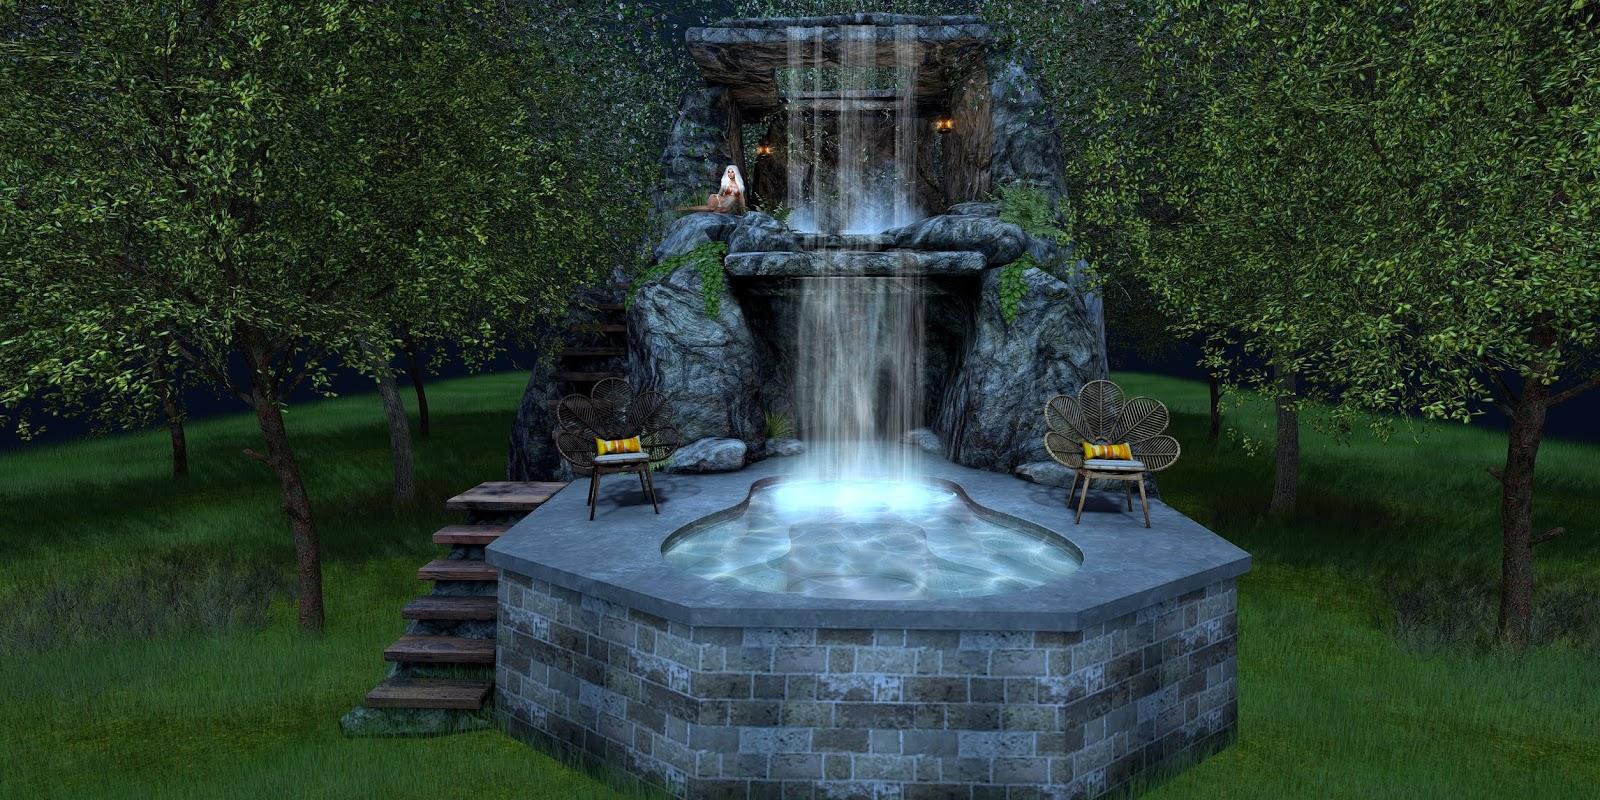 My Own Waterfall